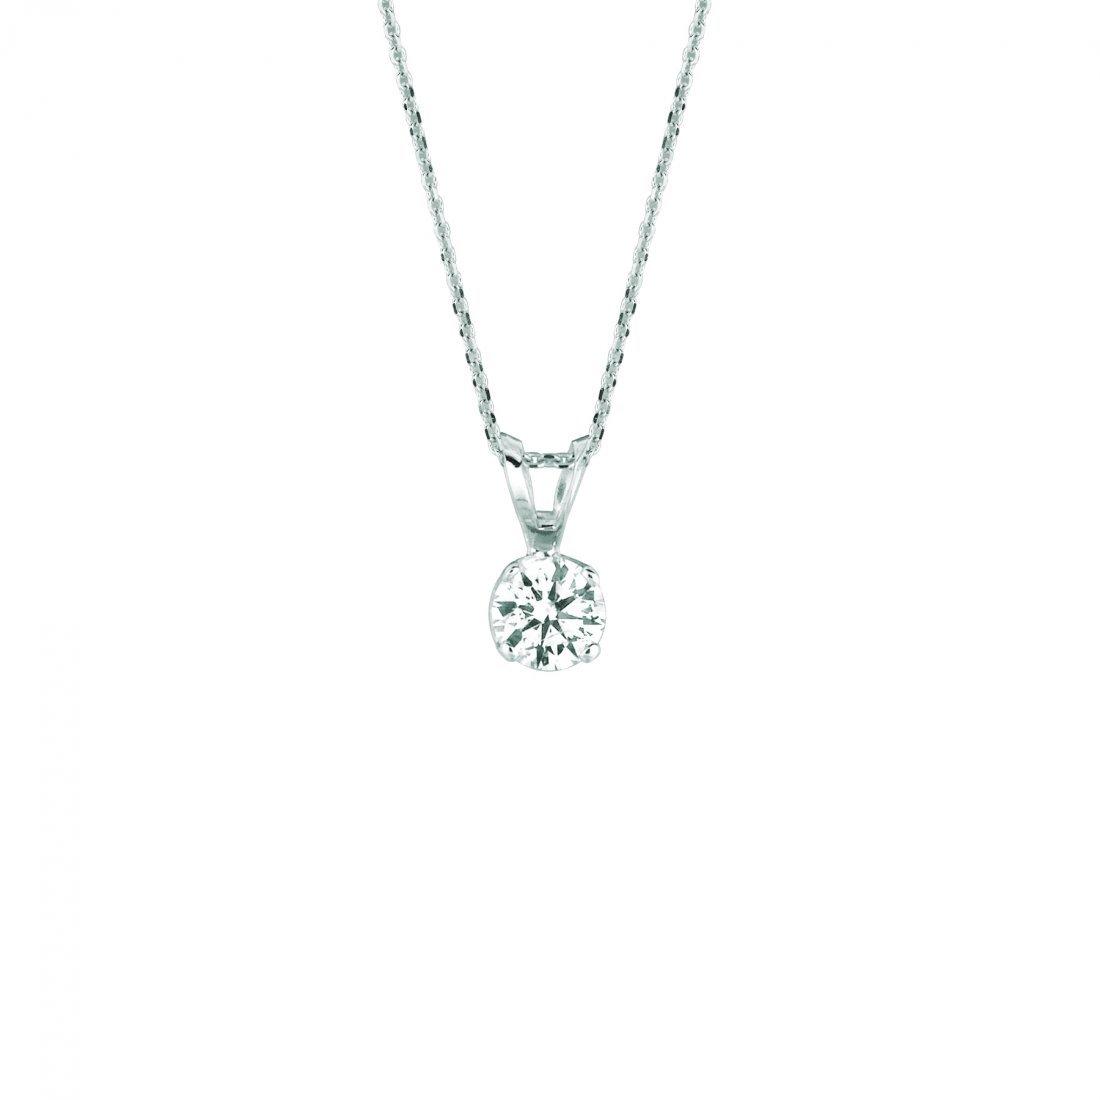 20 pointer diamond necklace